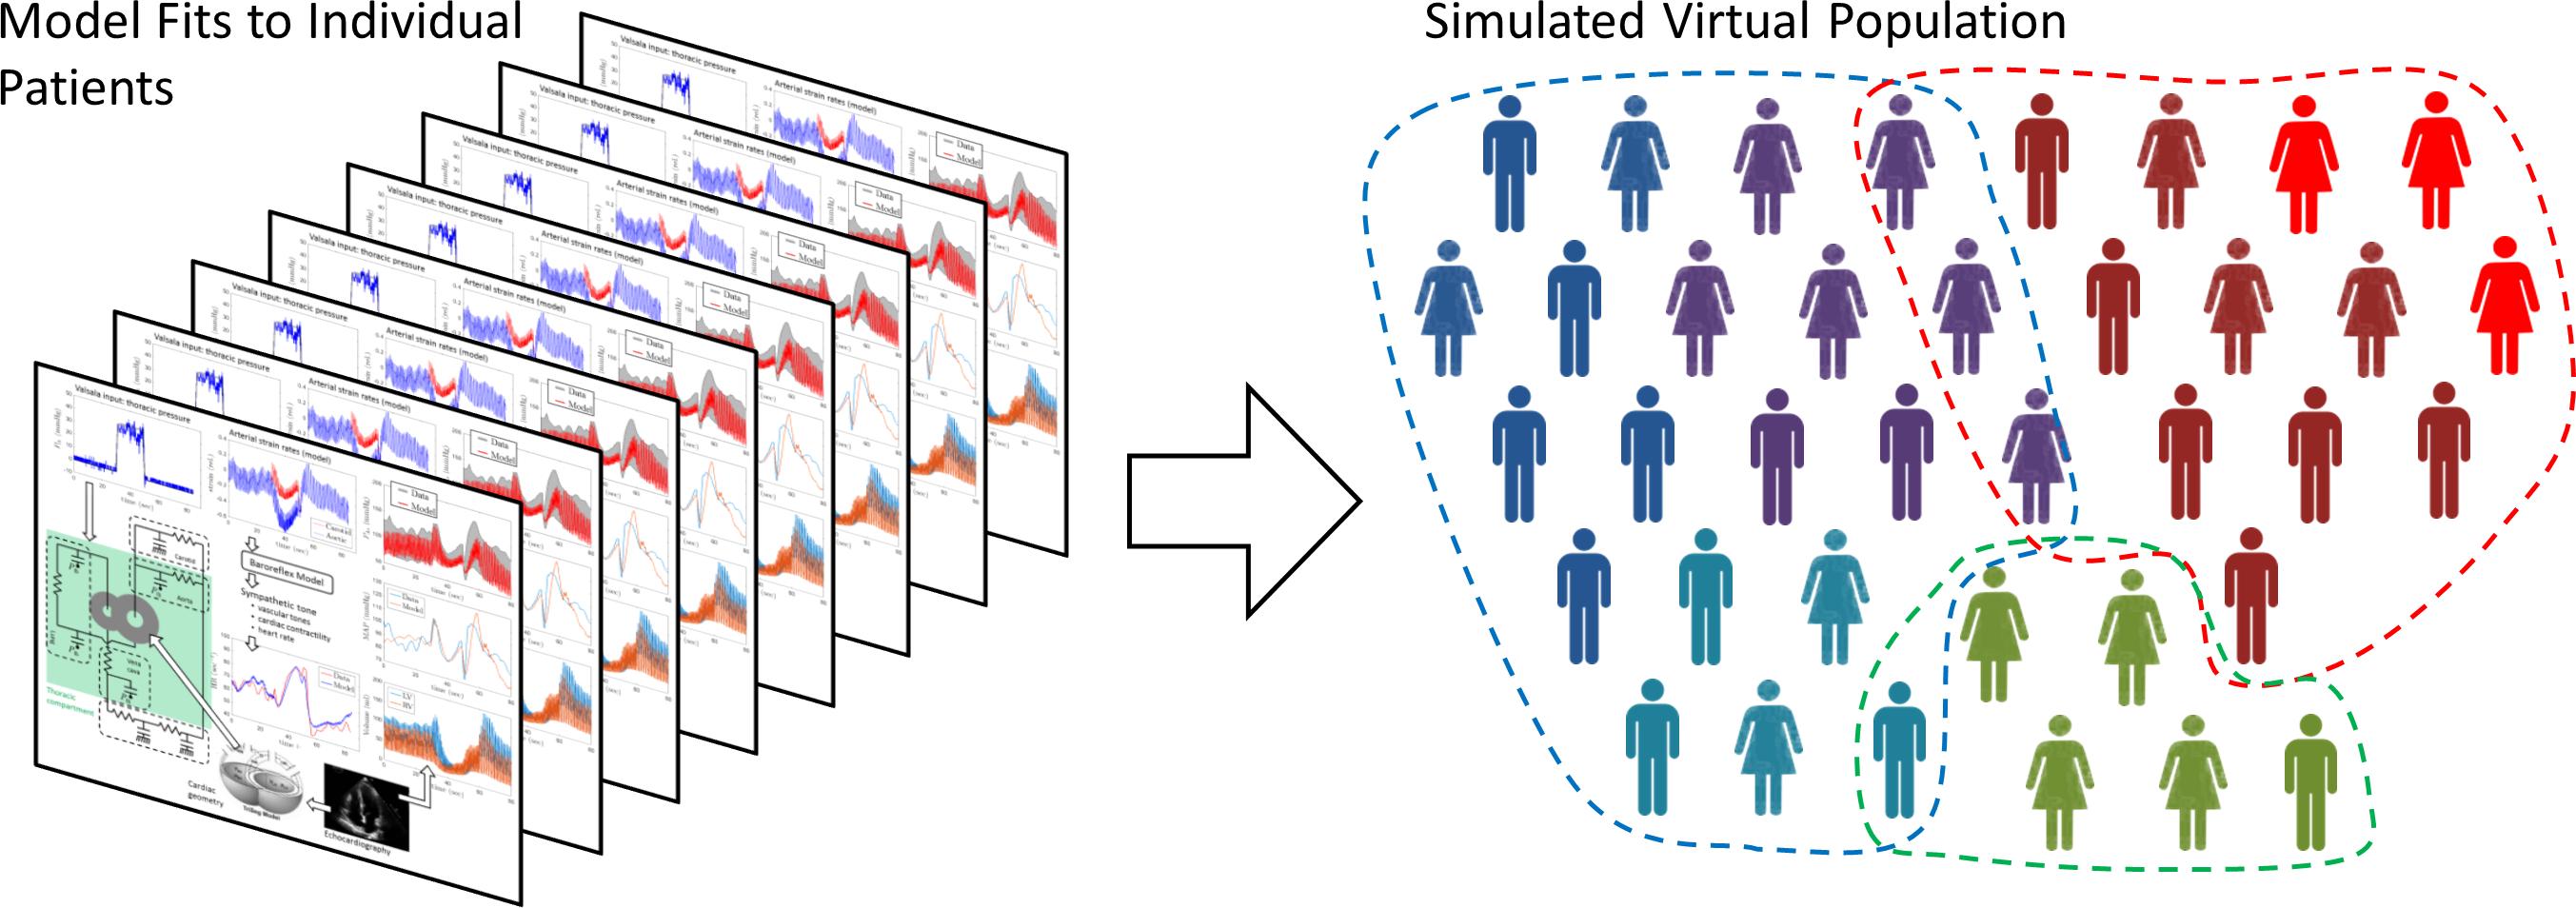 Virtual Population